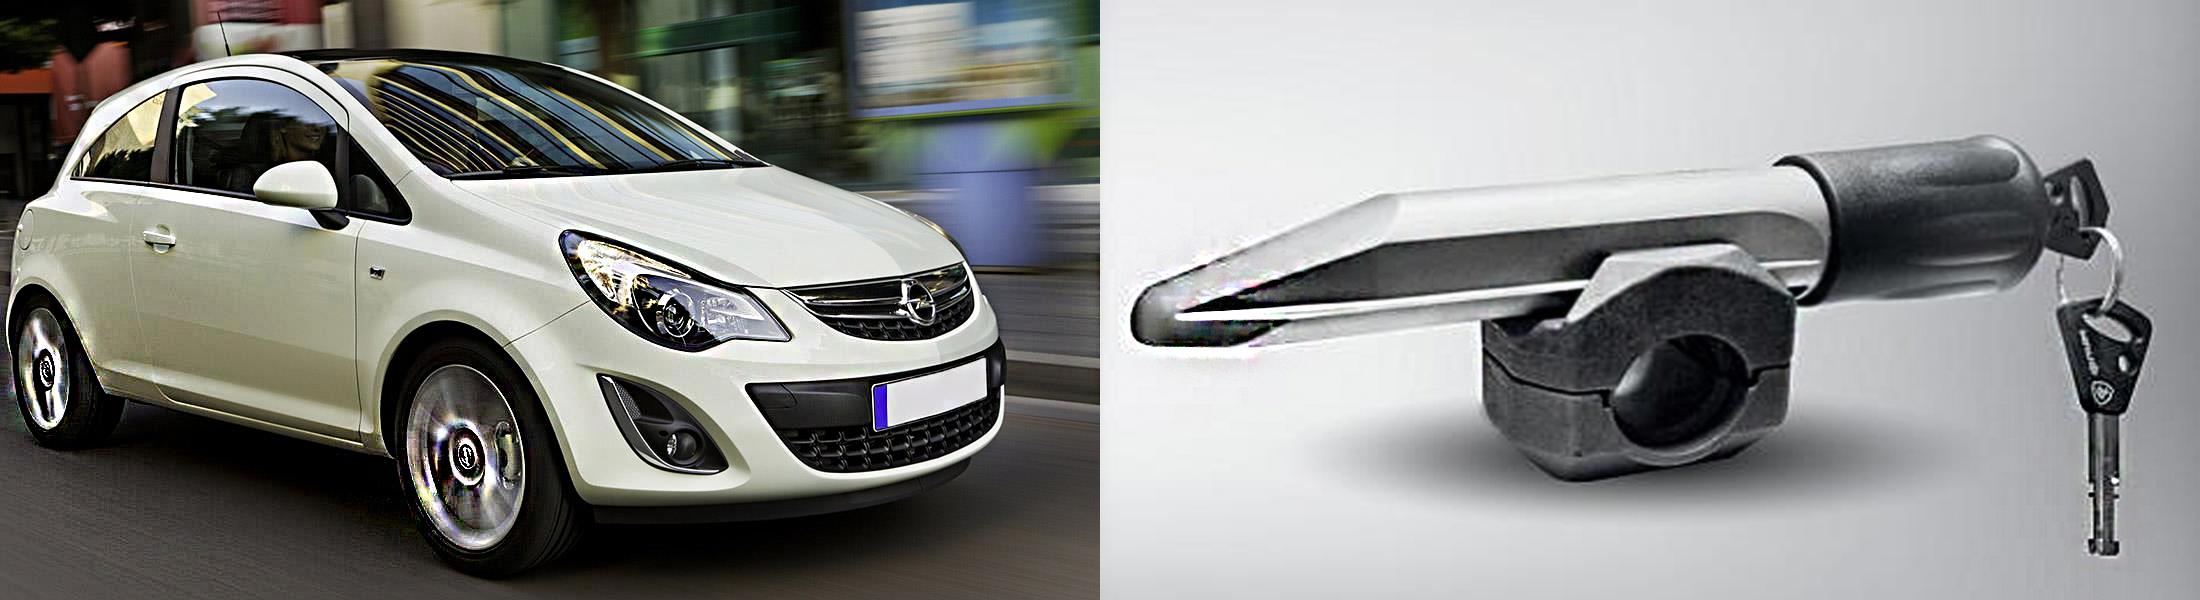 Opel Corsa /2011-/Элур, Гарант Блок Люкс 280.E